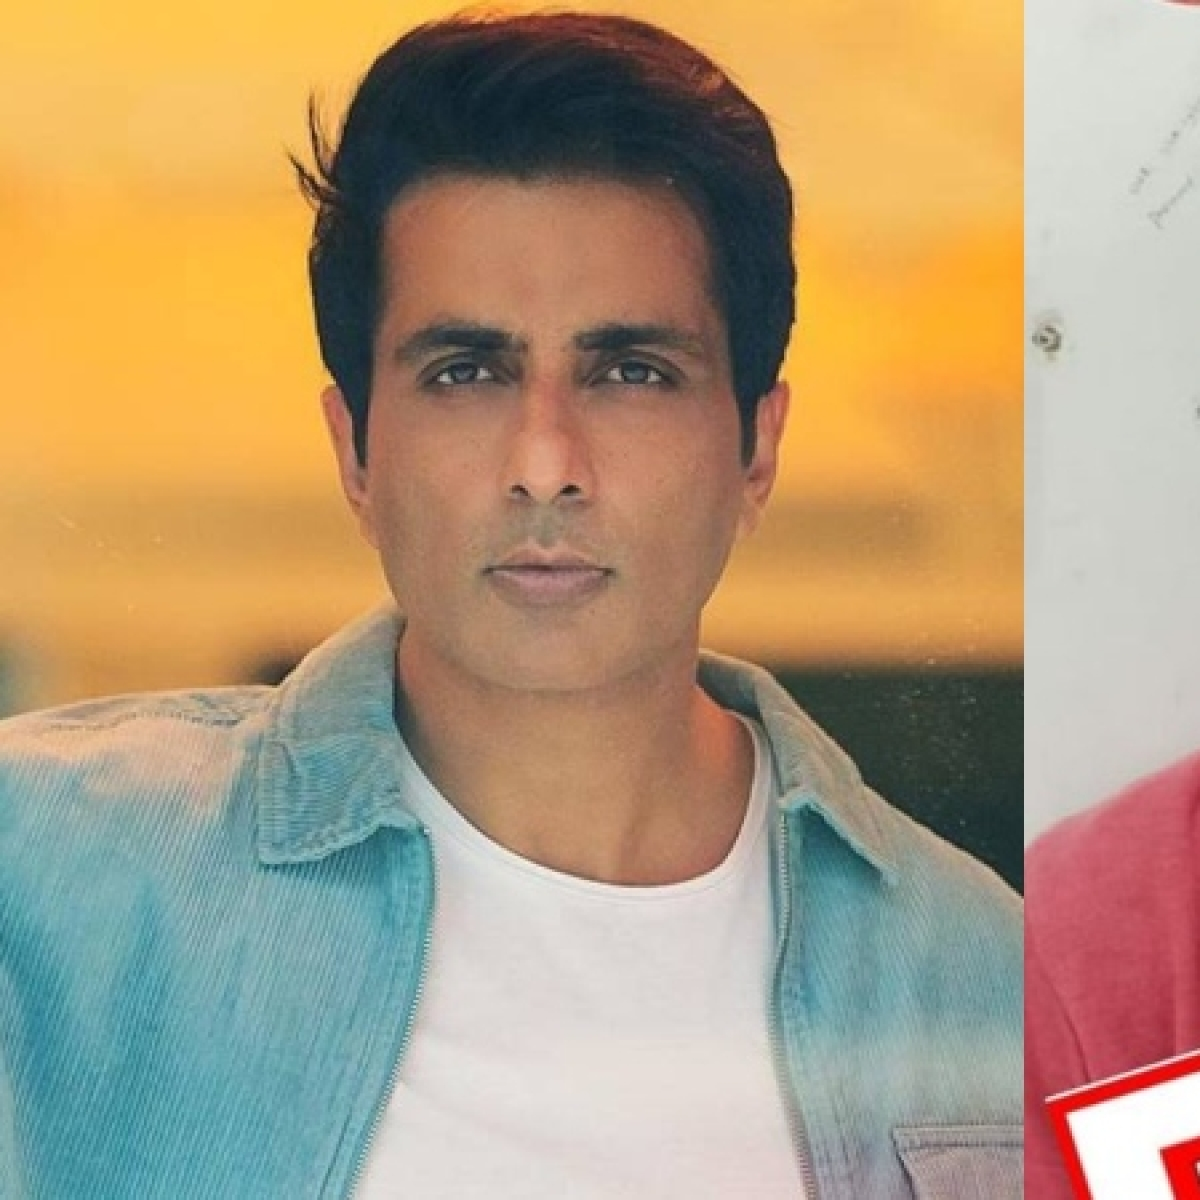 Sonu Sood impersonator held for 'cheating needy people', actor warns